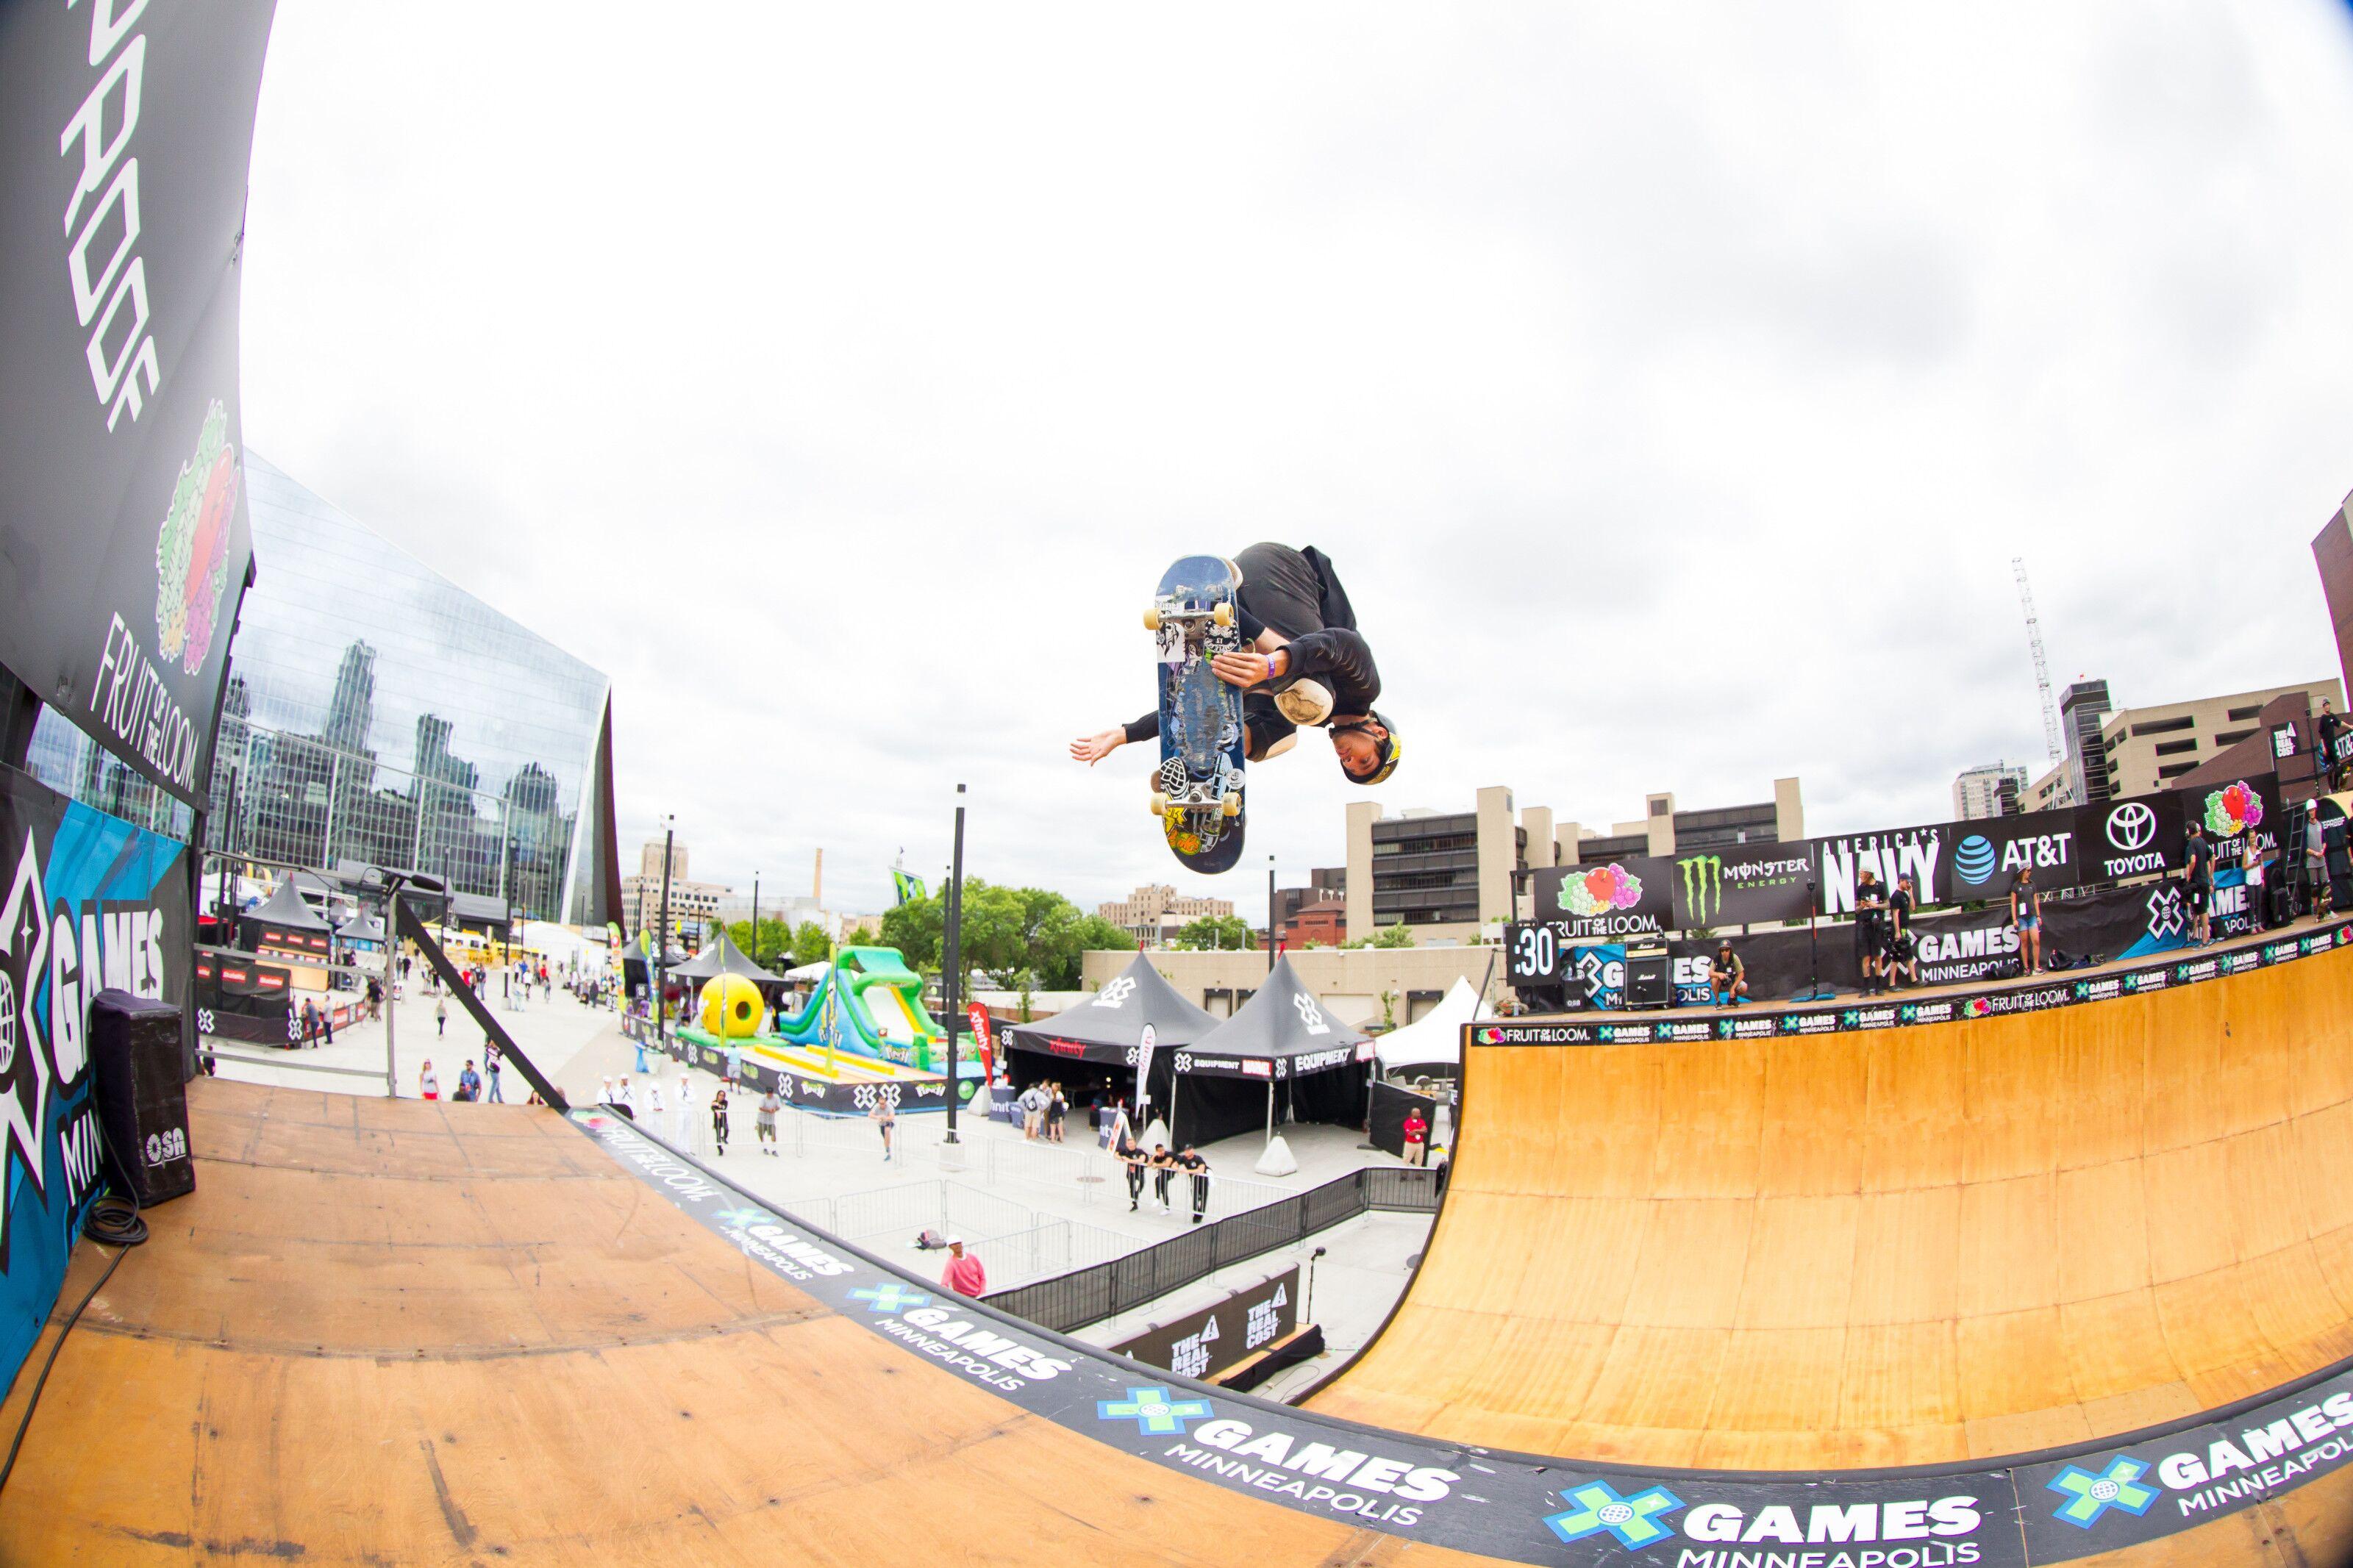 X Games Minneapolis 2018: Skateboard vert results